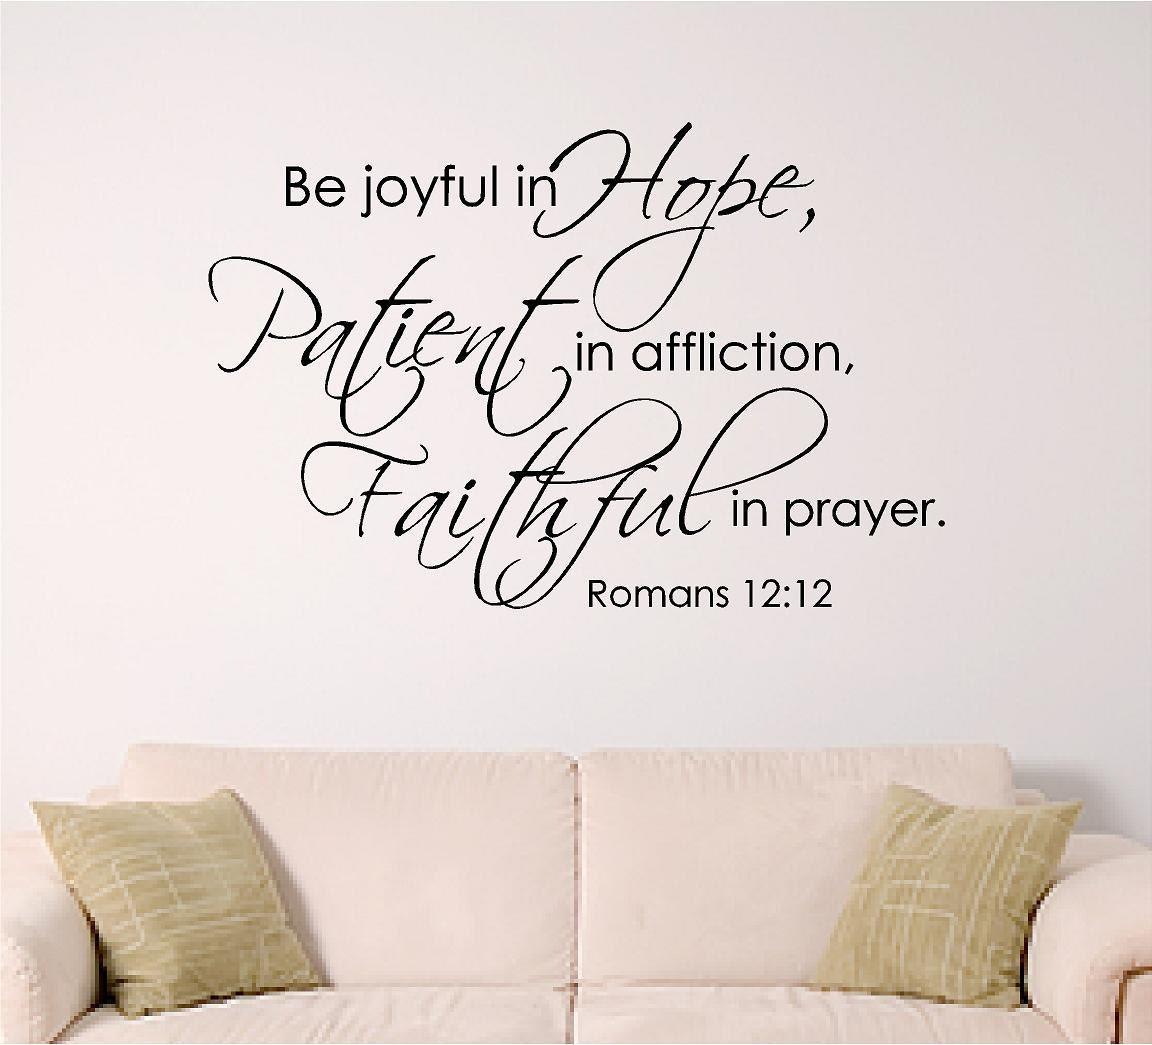 bible verse wall decal Be joyful in hope patient in